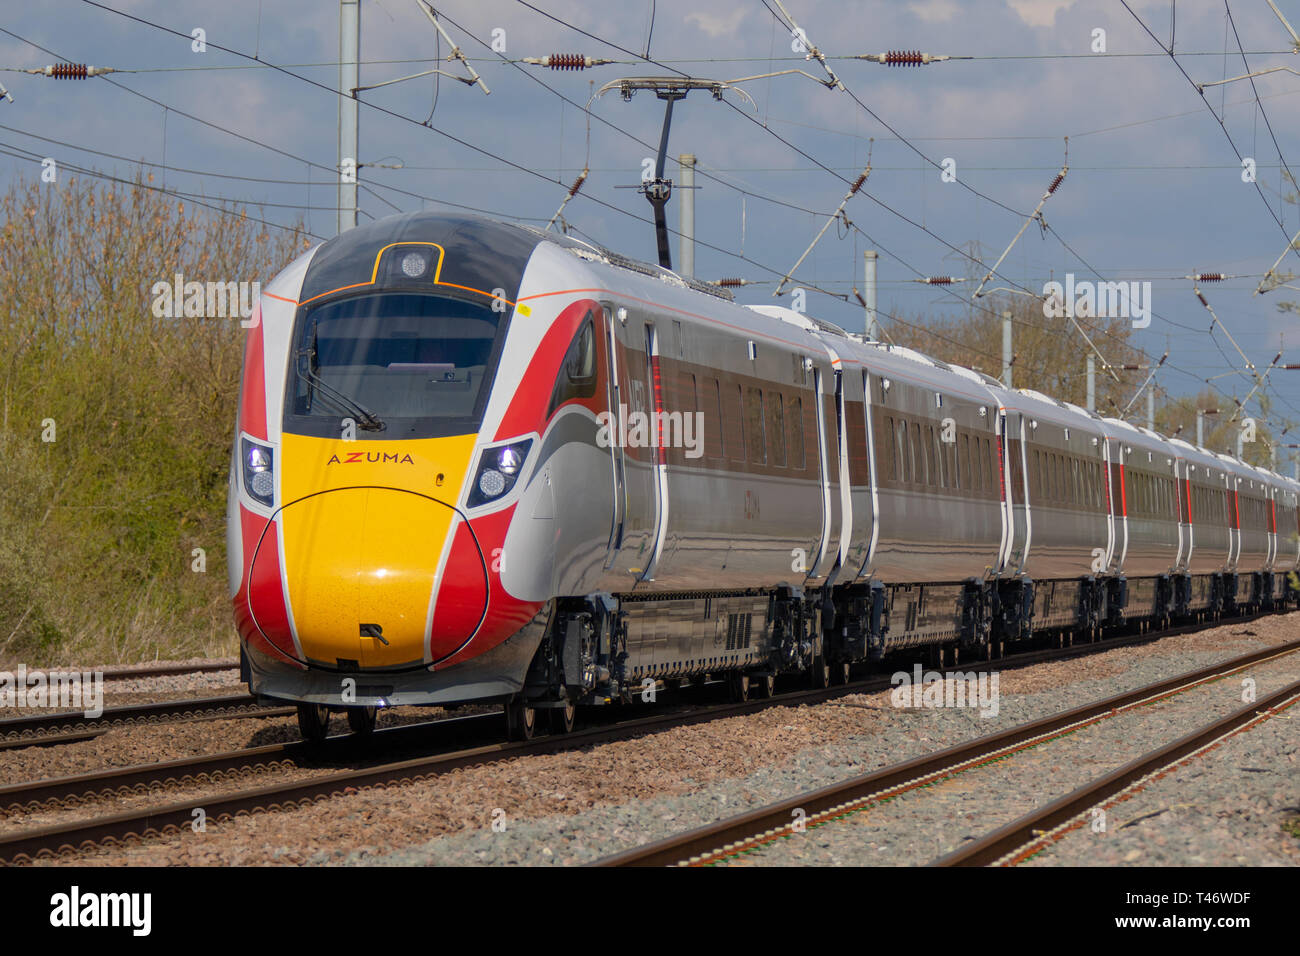 New LNER Hitachi 800 Azuma Electric Train - Stock Image